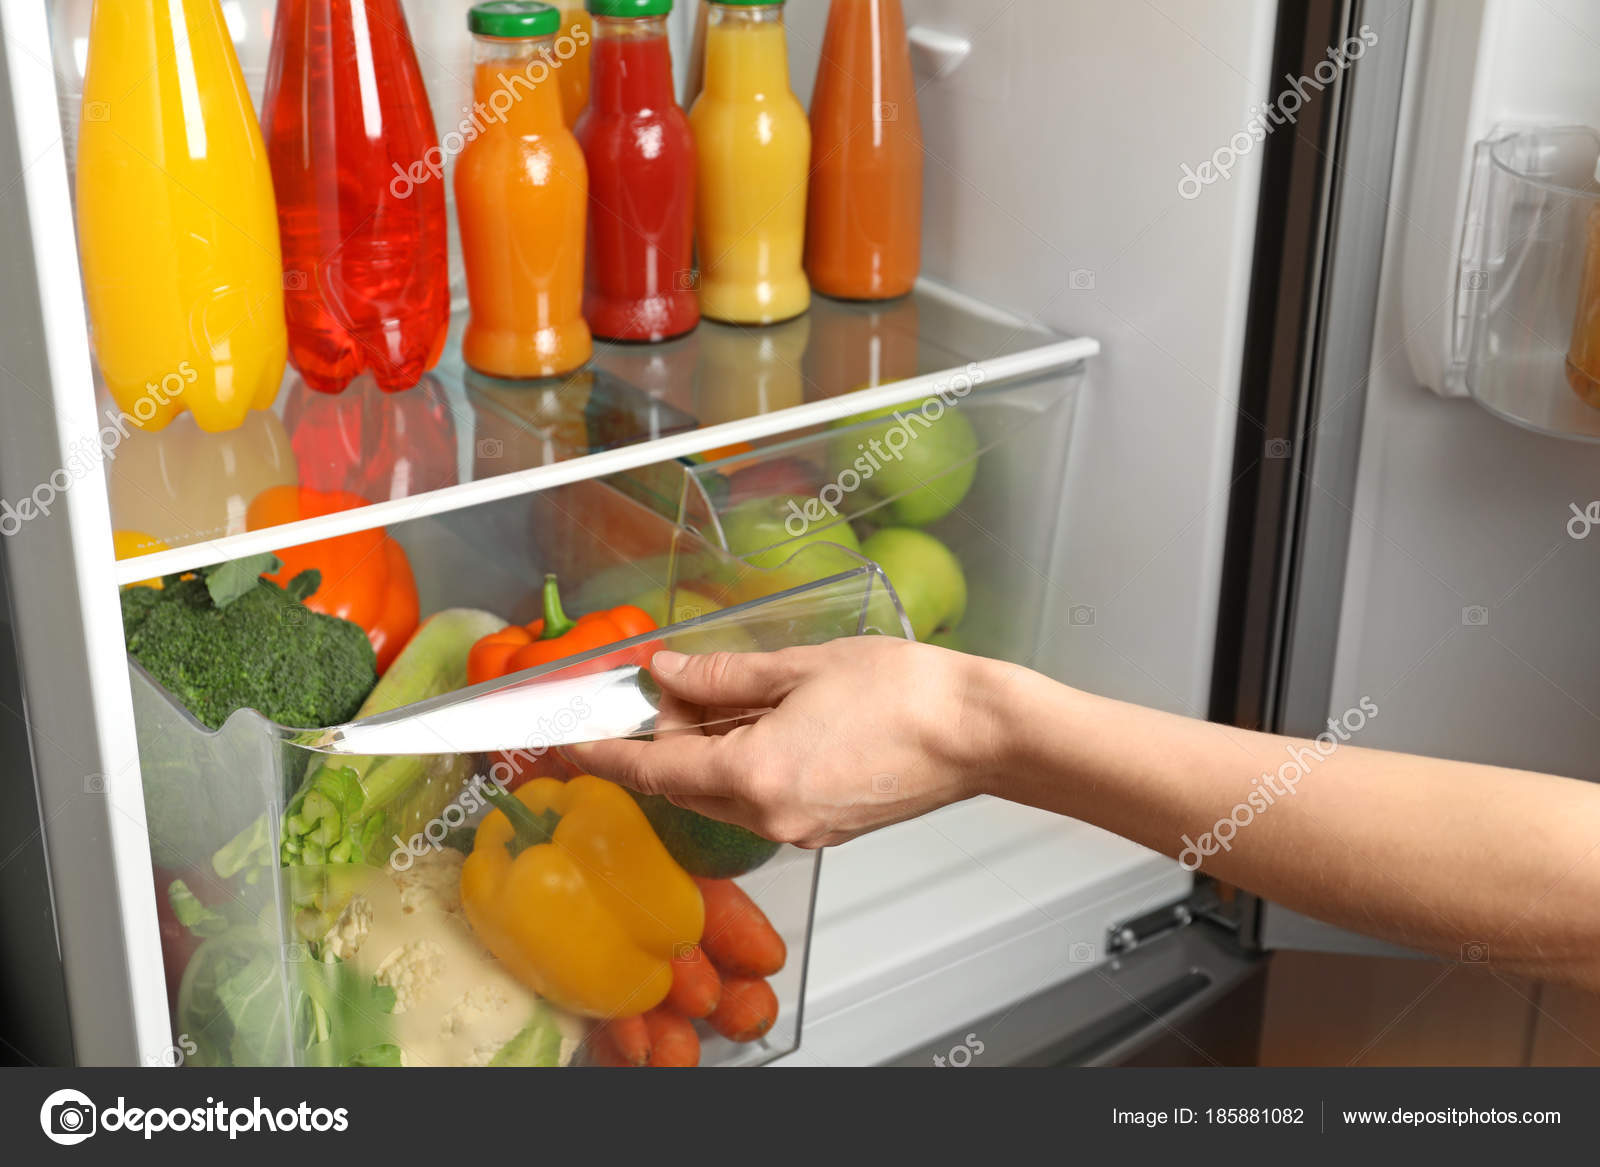 Kühlschrank Schublade : Frau eröffnung schublade kühlschrank mit gemüse u stockfoto